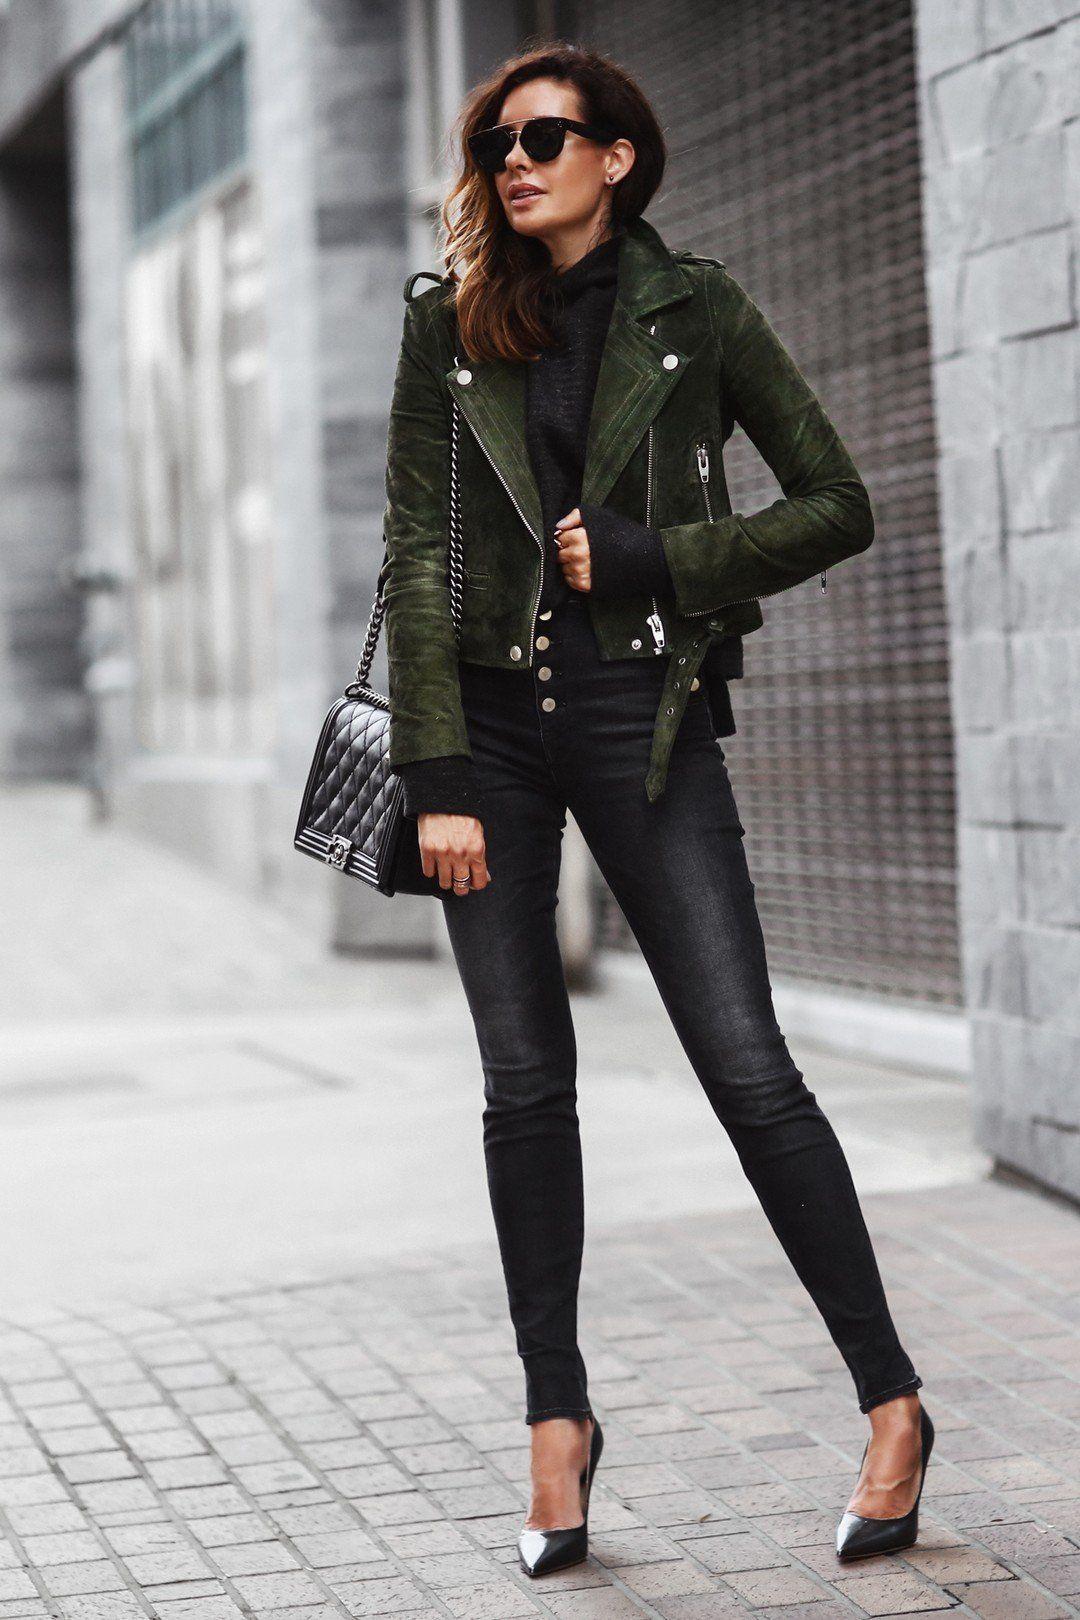 CHIC Personal Fashion Stylist - Part 2